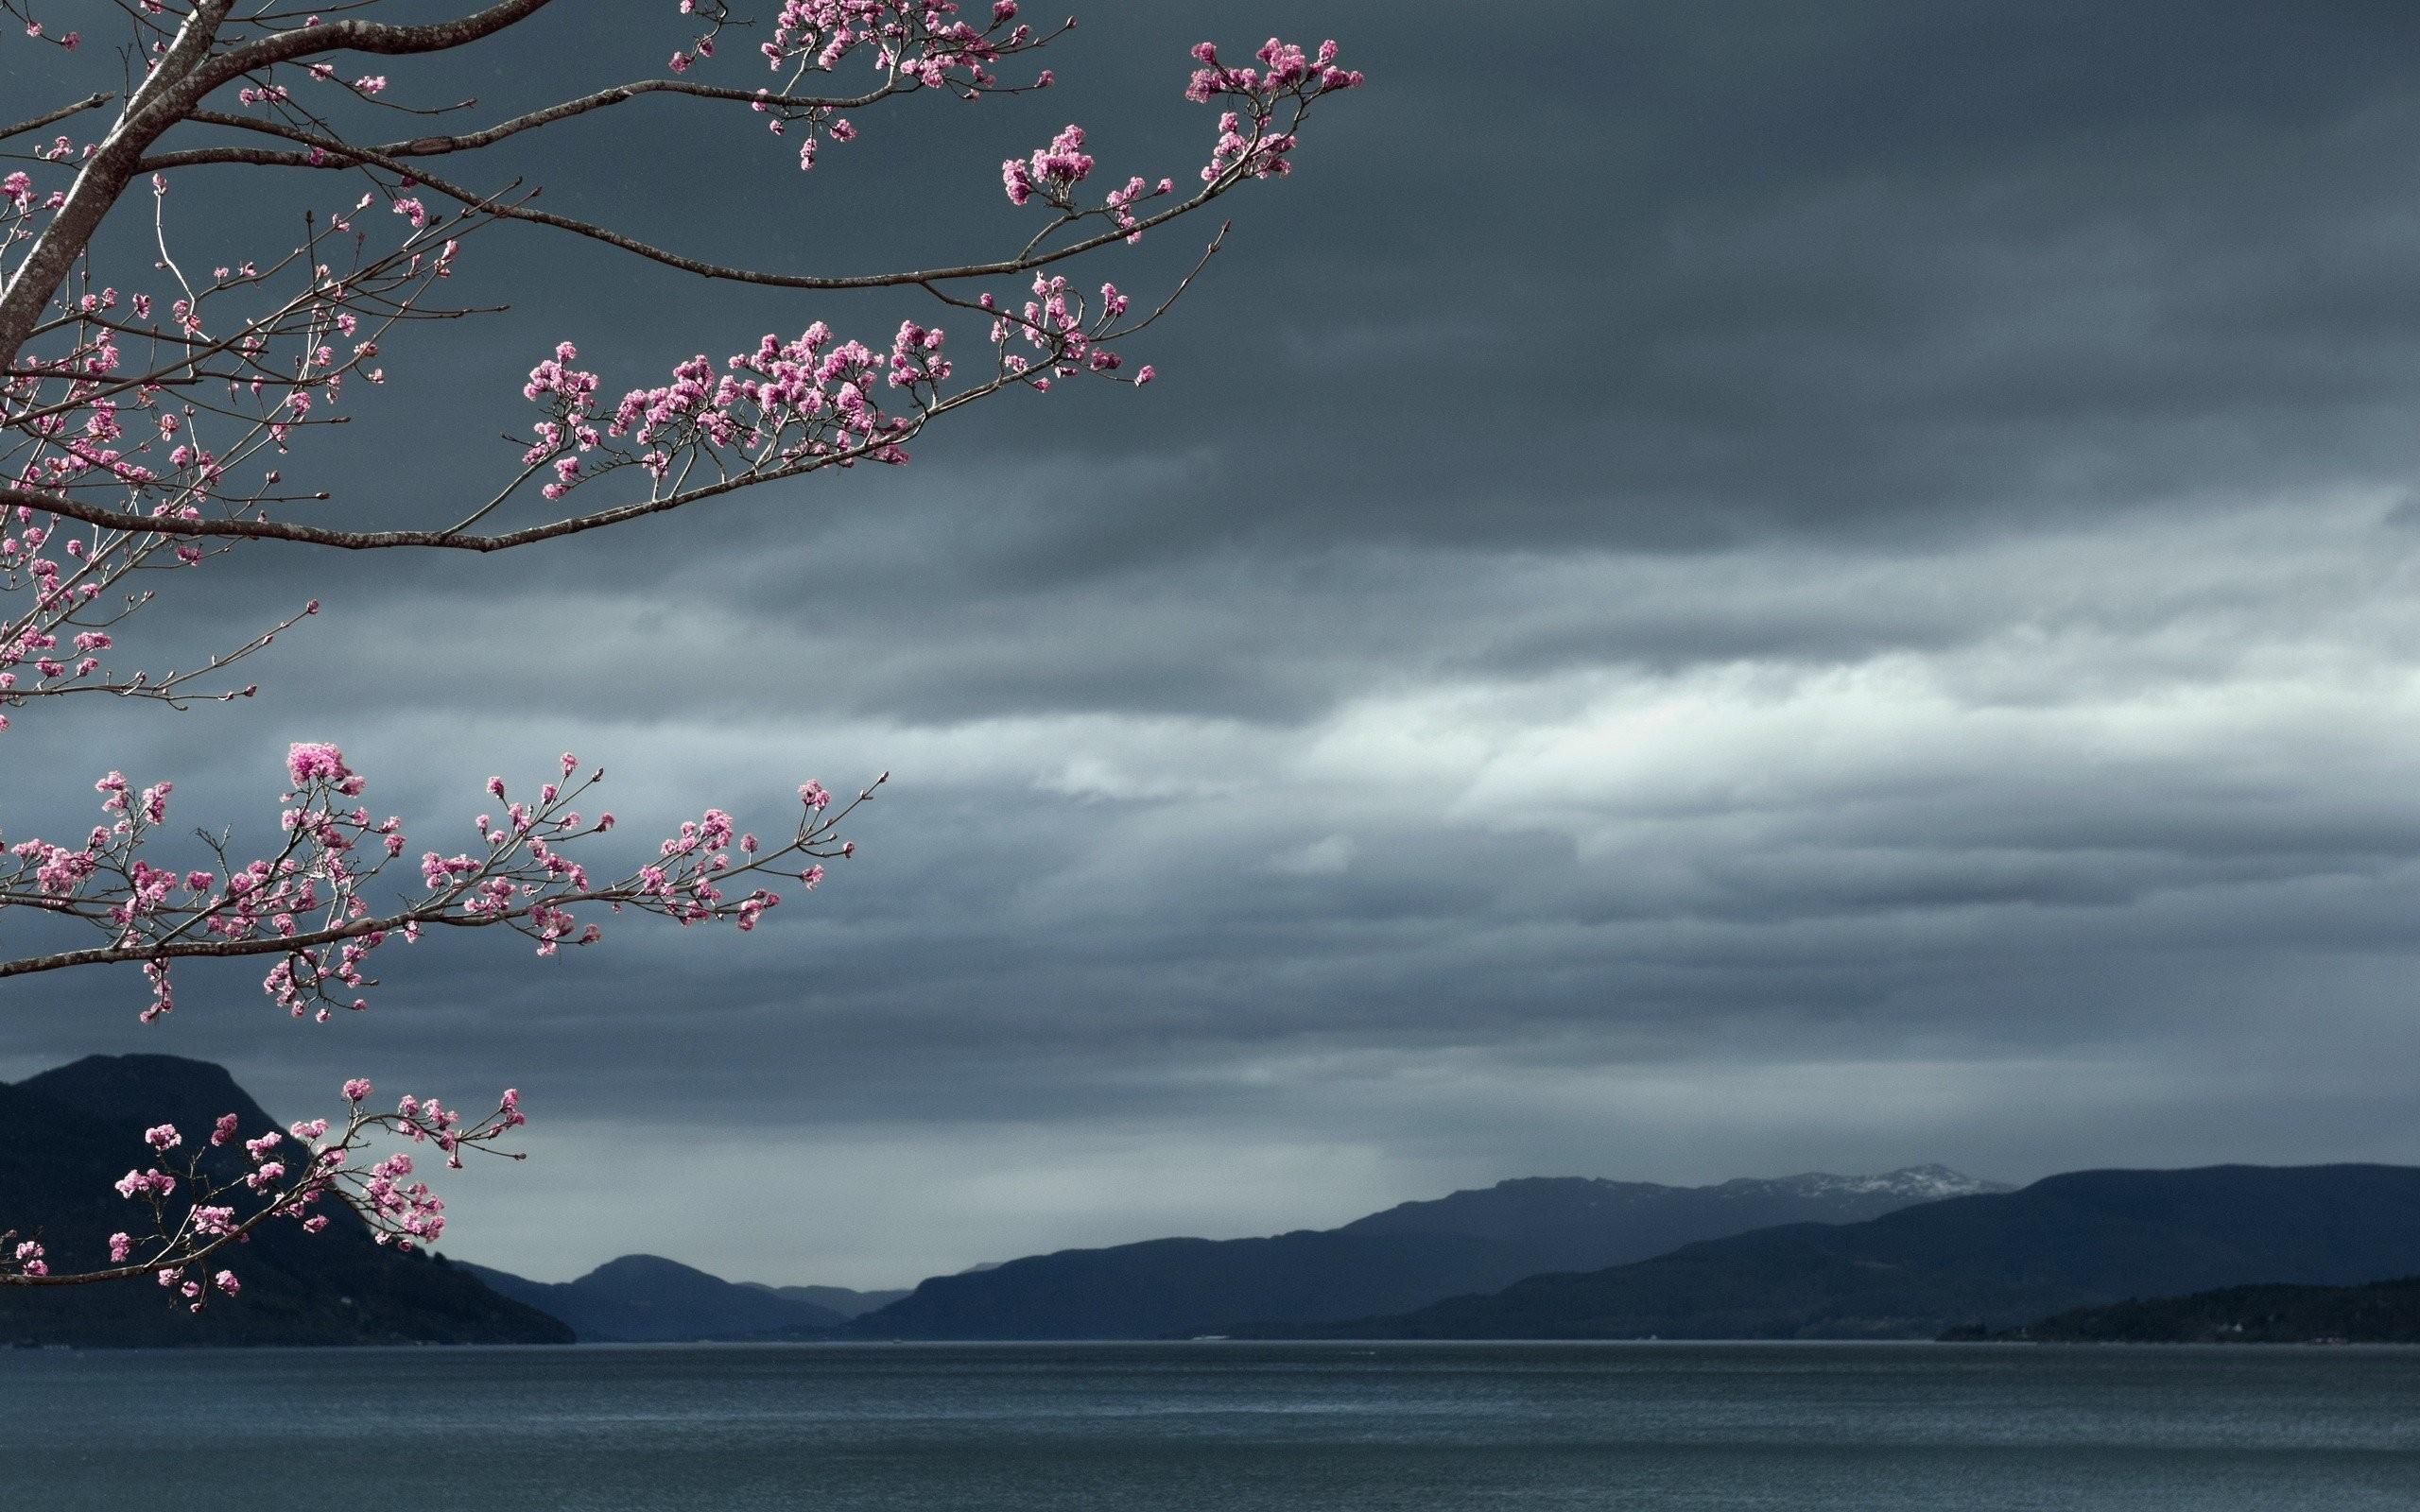 Lake Twitter Tree Flowerss Cherry Blossom